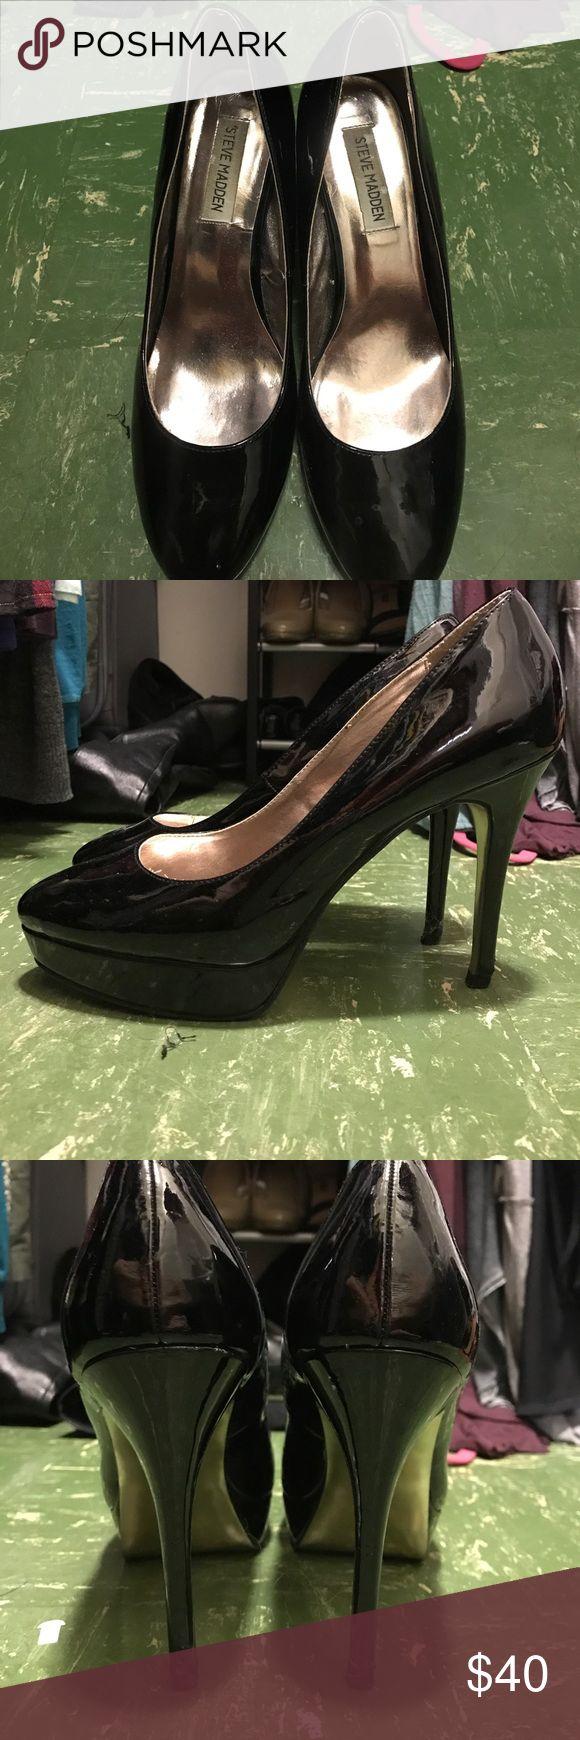 "Steve Madden Pumps Black 9.5 Steve Madden heels 4"" black patent leather with gold soles with a half inch platform Steve Madden Shoes Heels"